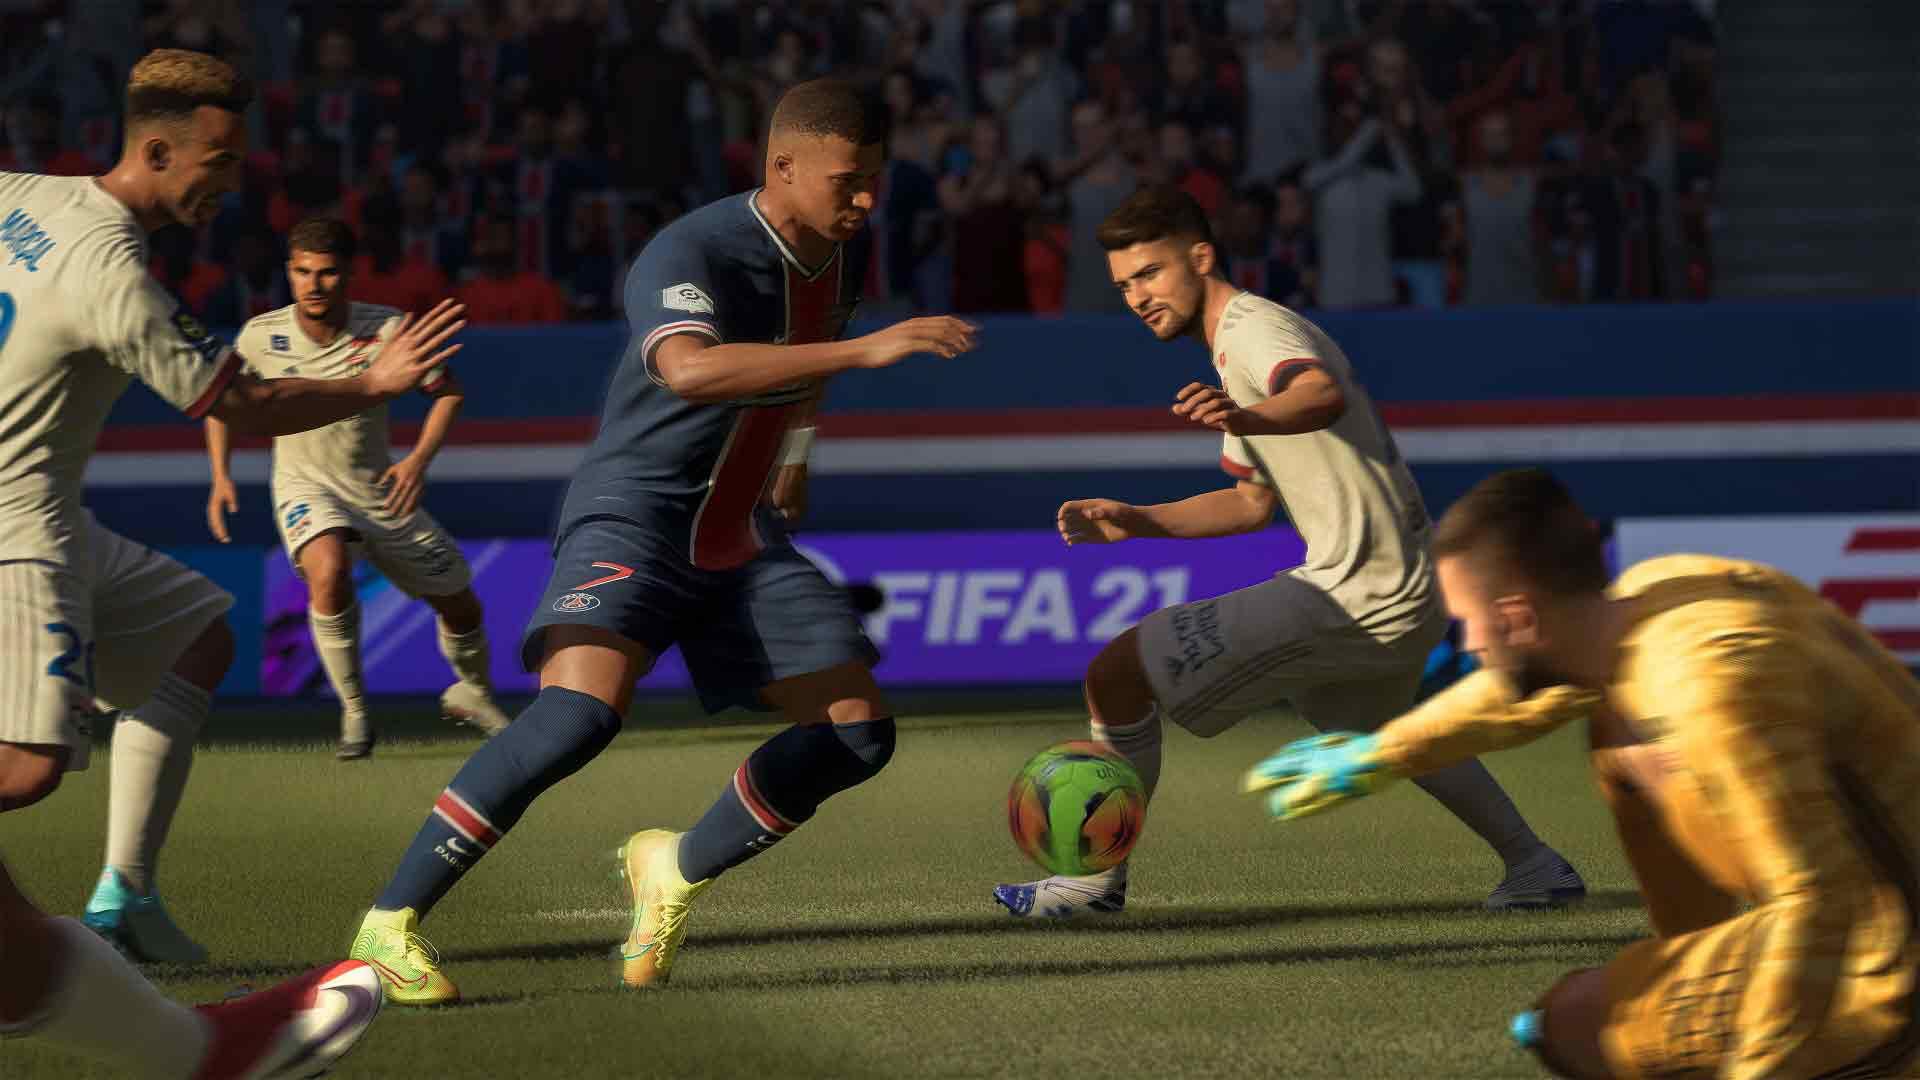 Fifa-21-เกมฟุตบอลยืนหนึ่งตลอดกาล2